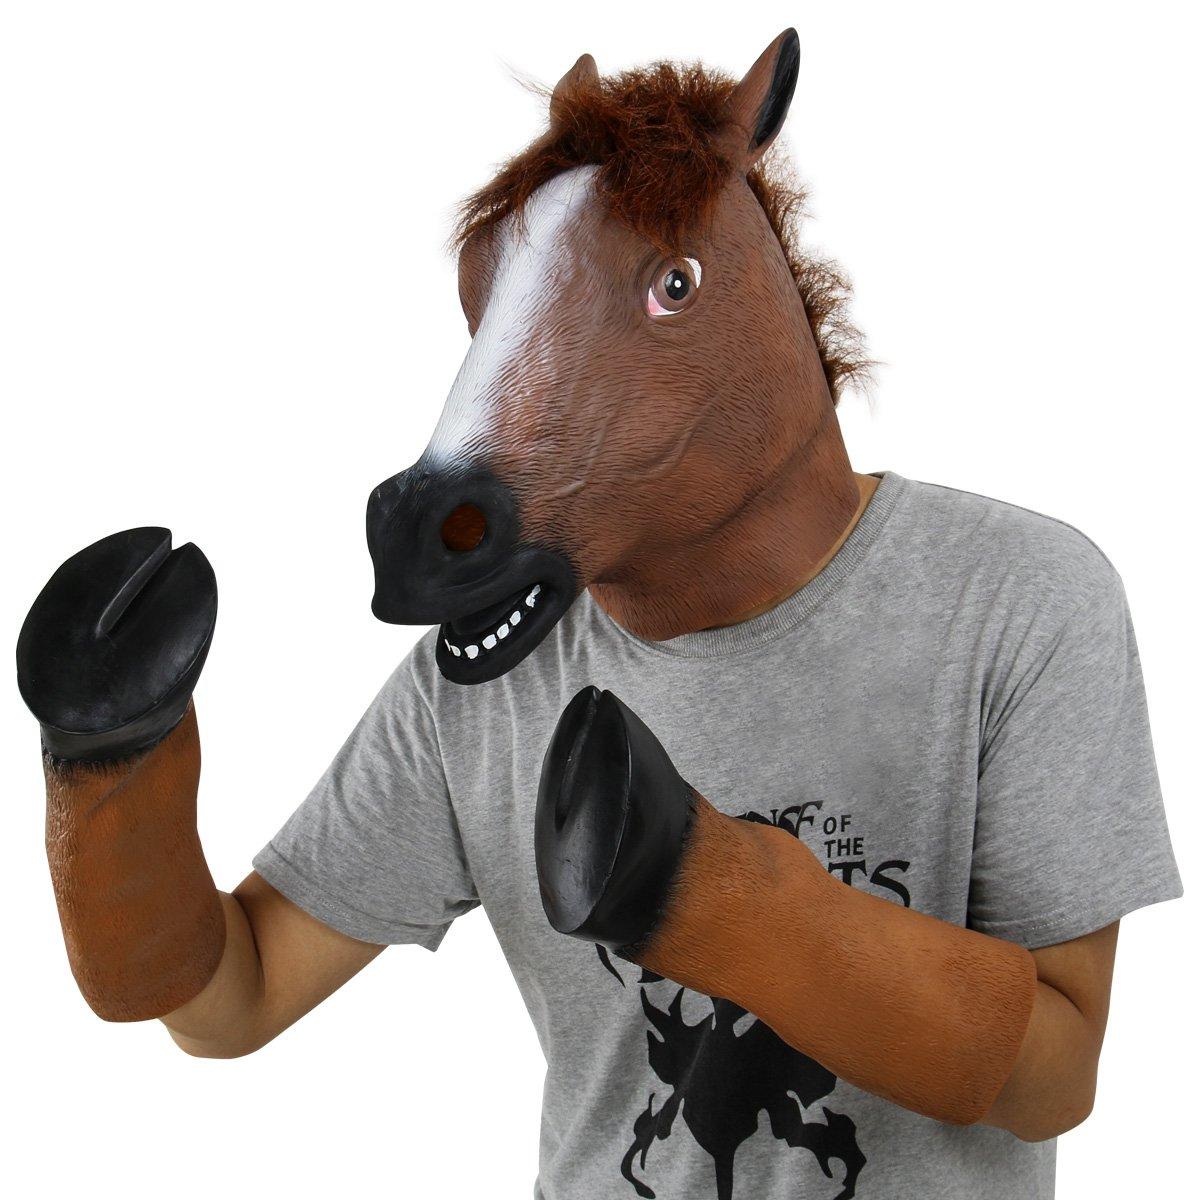 Amazon.com: BengPro Novelty Latex Rubber Creepy Horse Head Mask ...